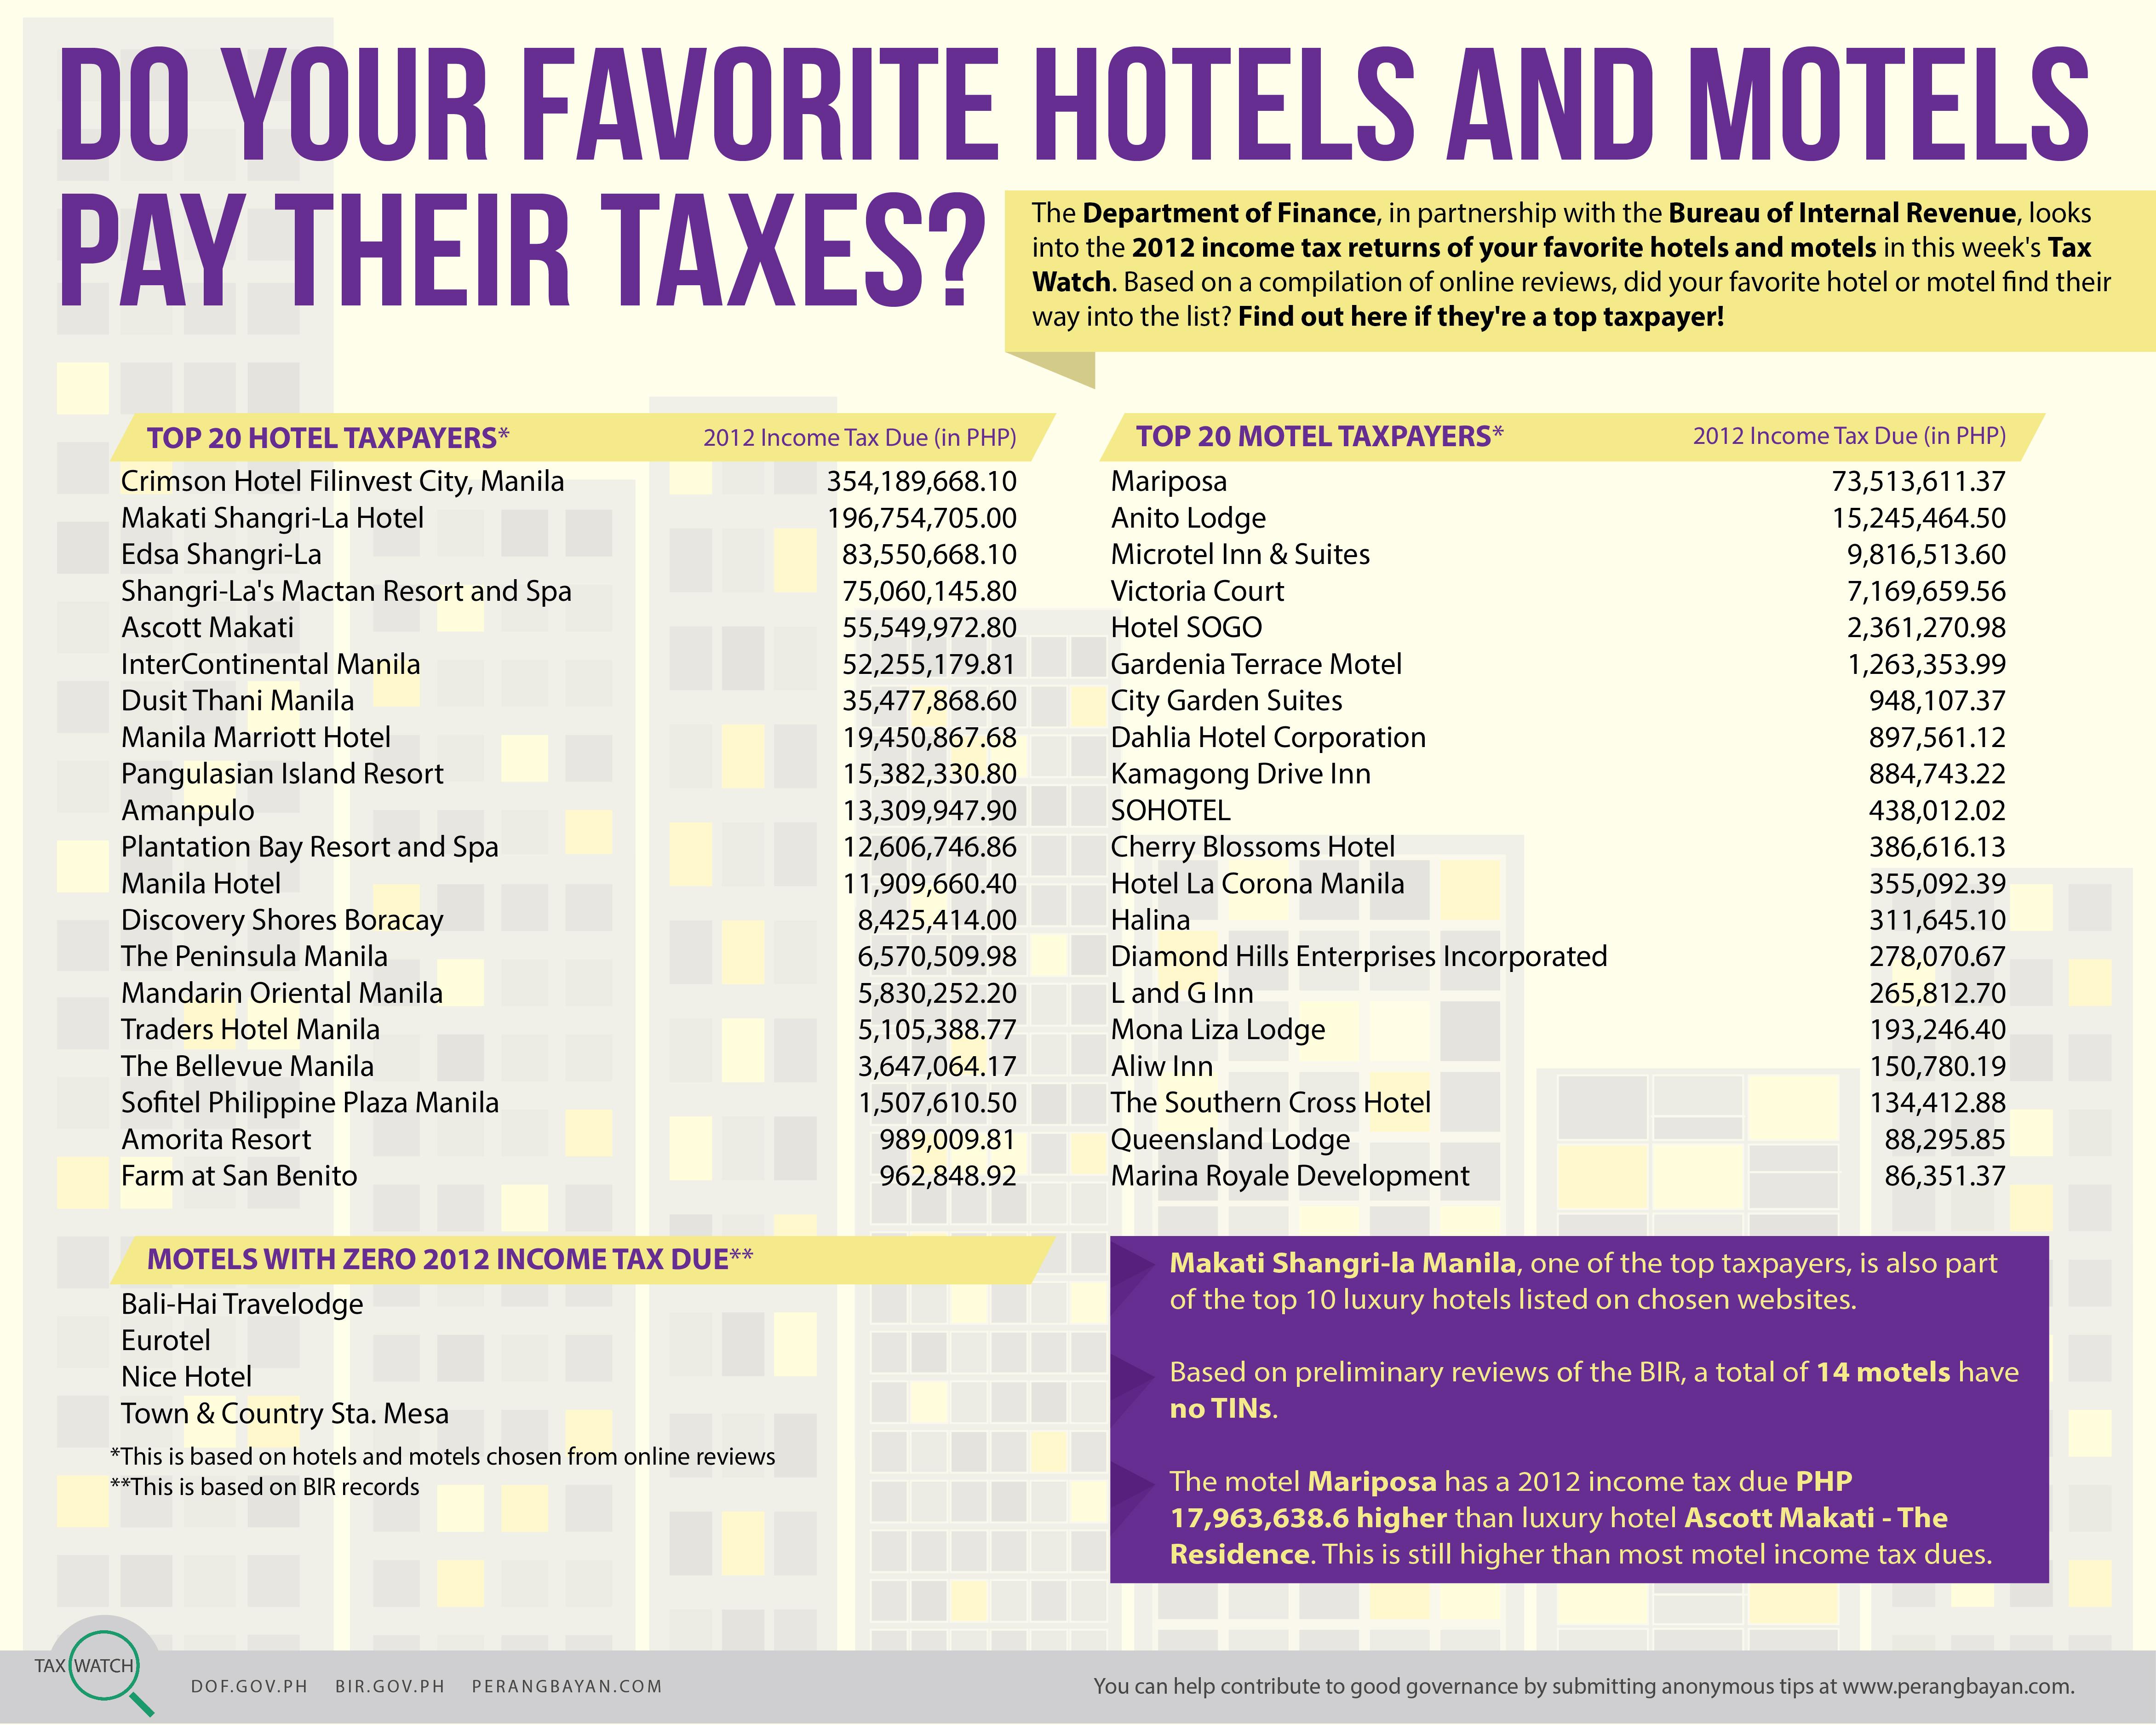 Tax Watch 27 Hotels & Motels (web)_v1_021914-01